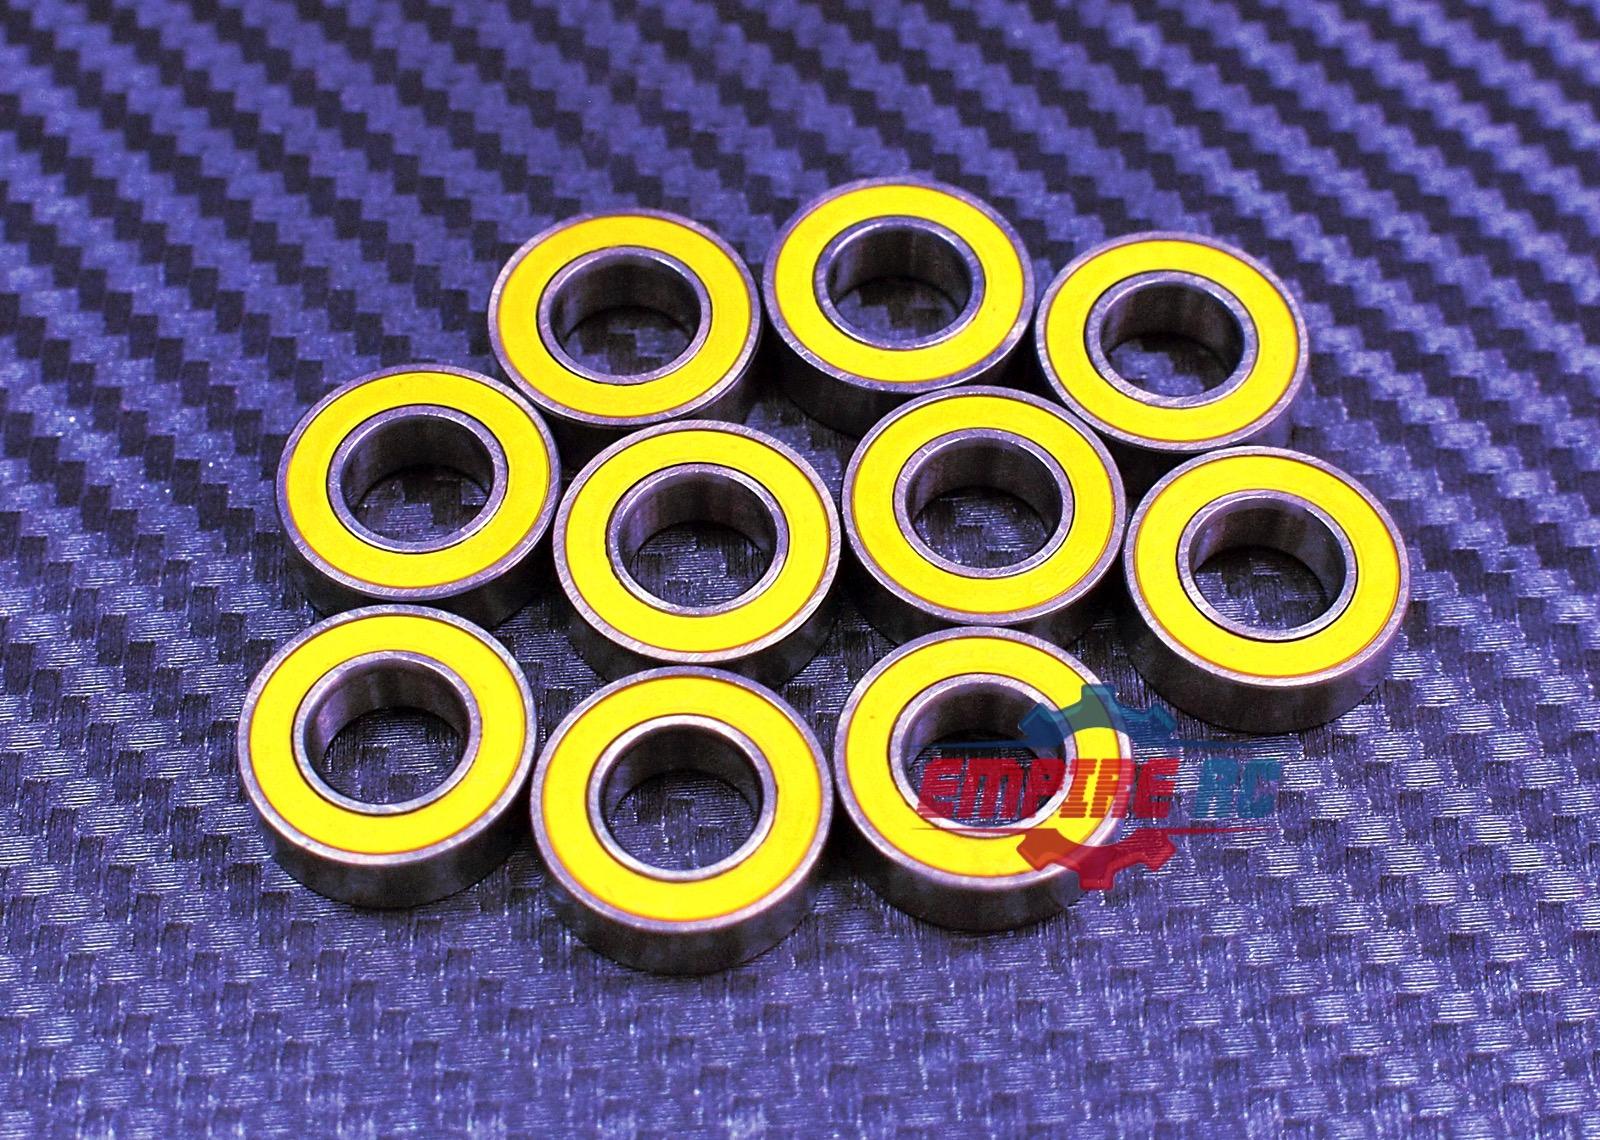 688-2RS 8x16x5 mm Bearing Rubber Blue Sealed Ball Bearings 688RS 10Pcs